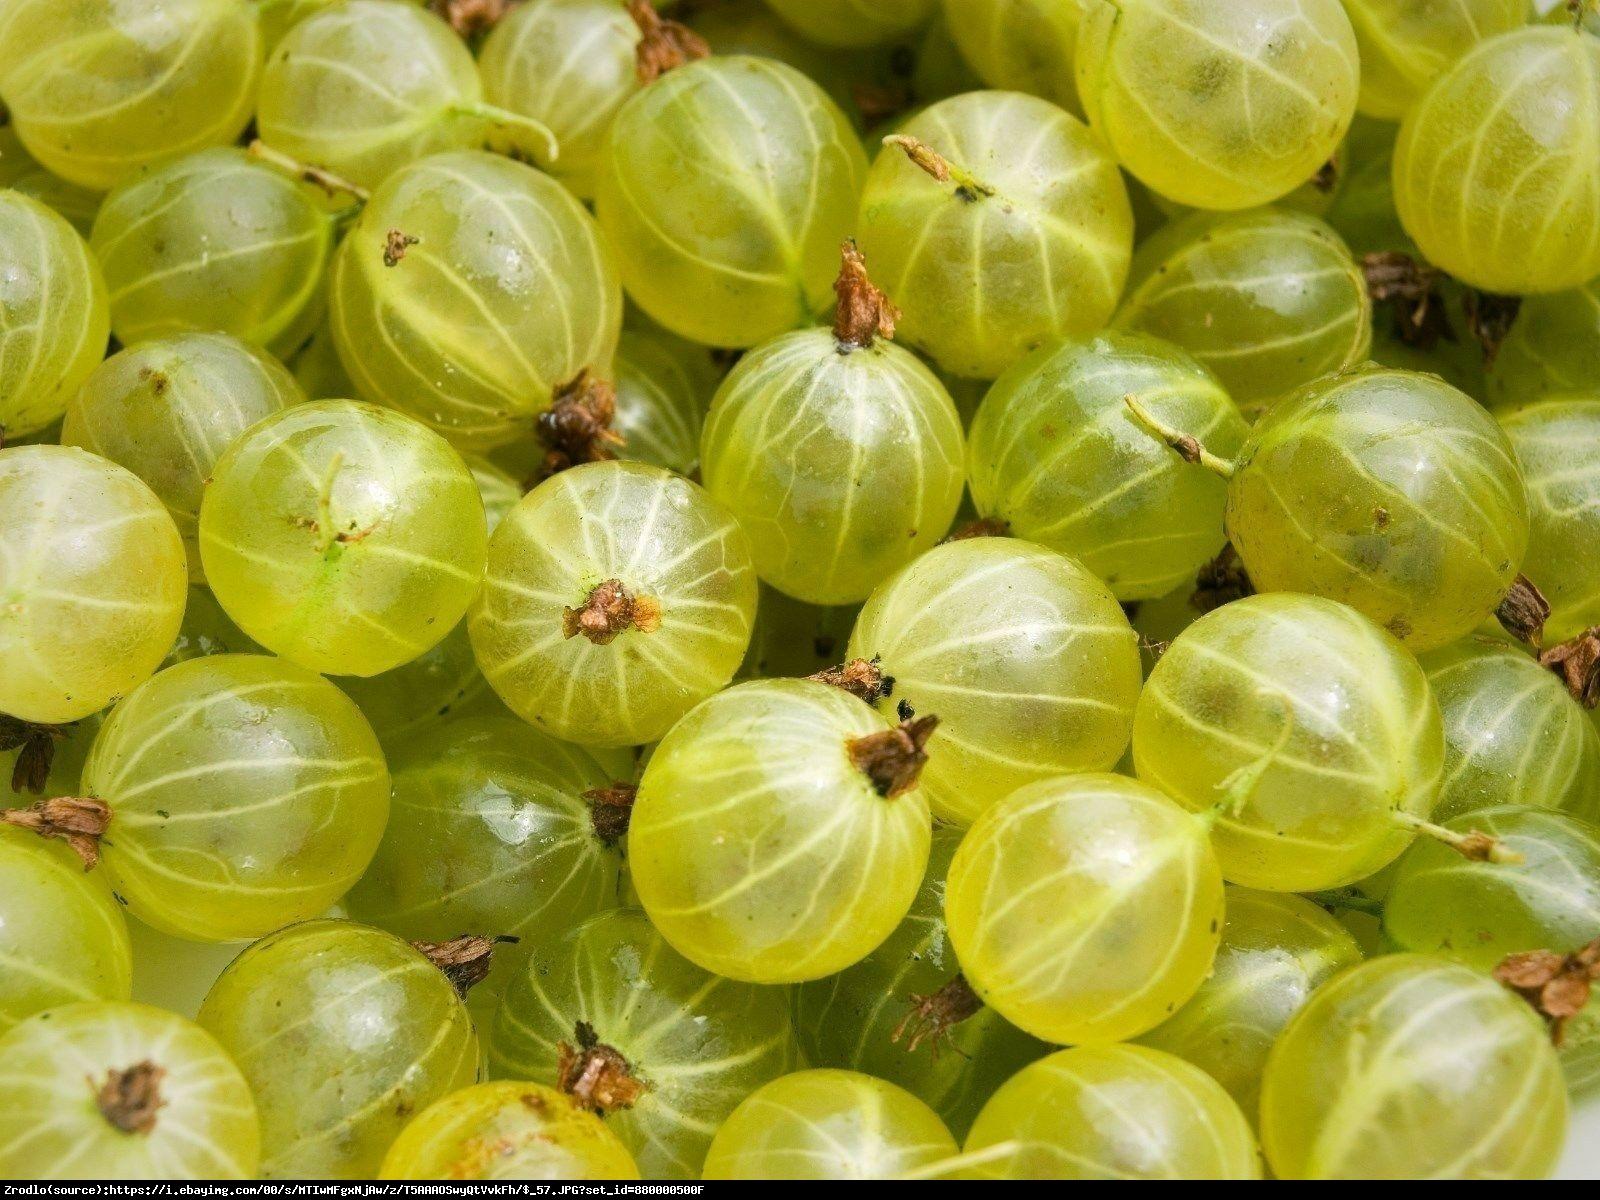 Agrest krzaczasty Invicta - WYSOKA ODPORNOŚĆ NA MRÓZ I CHOROBY!!! - Ribes uva-crispa Invicta